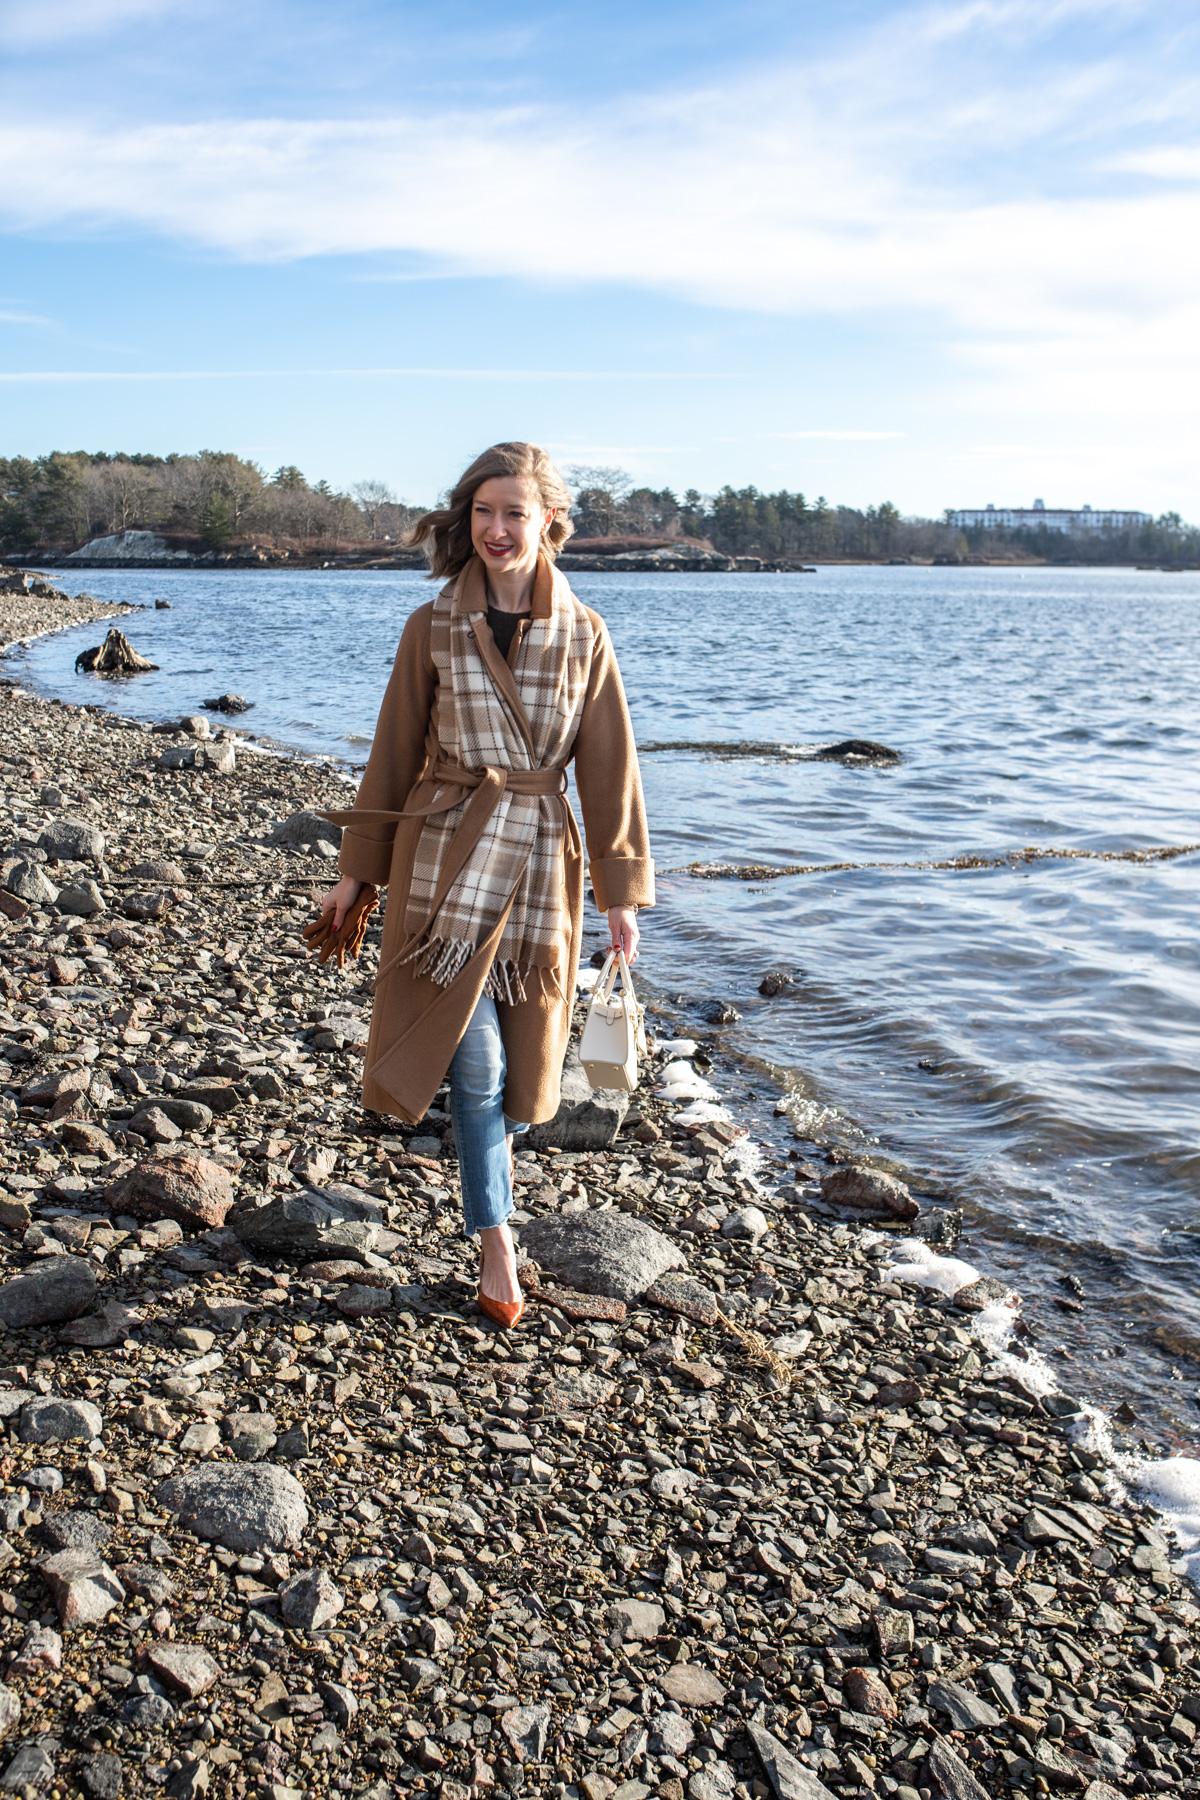 Stacie Flinner x Camel Monochromatic Outfit-11.jpg